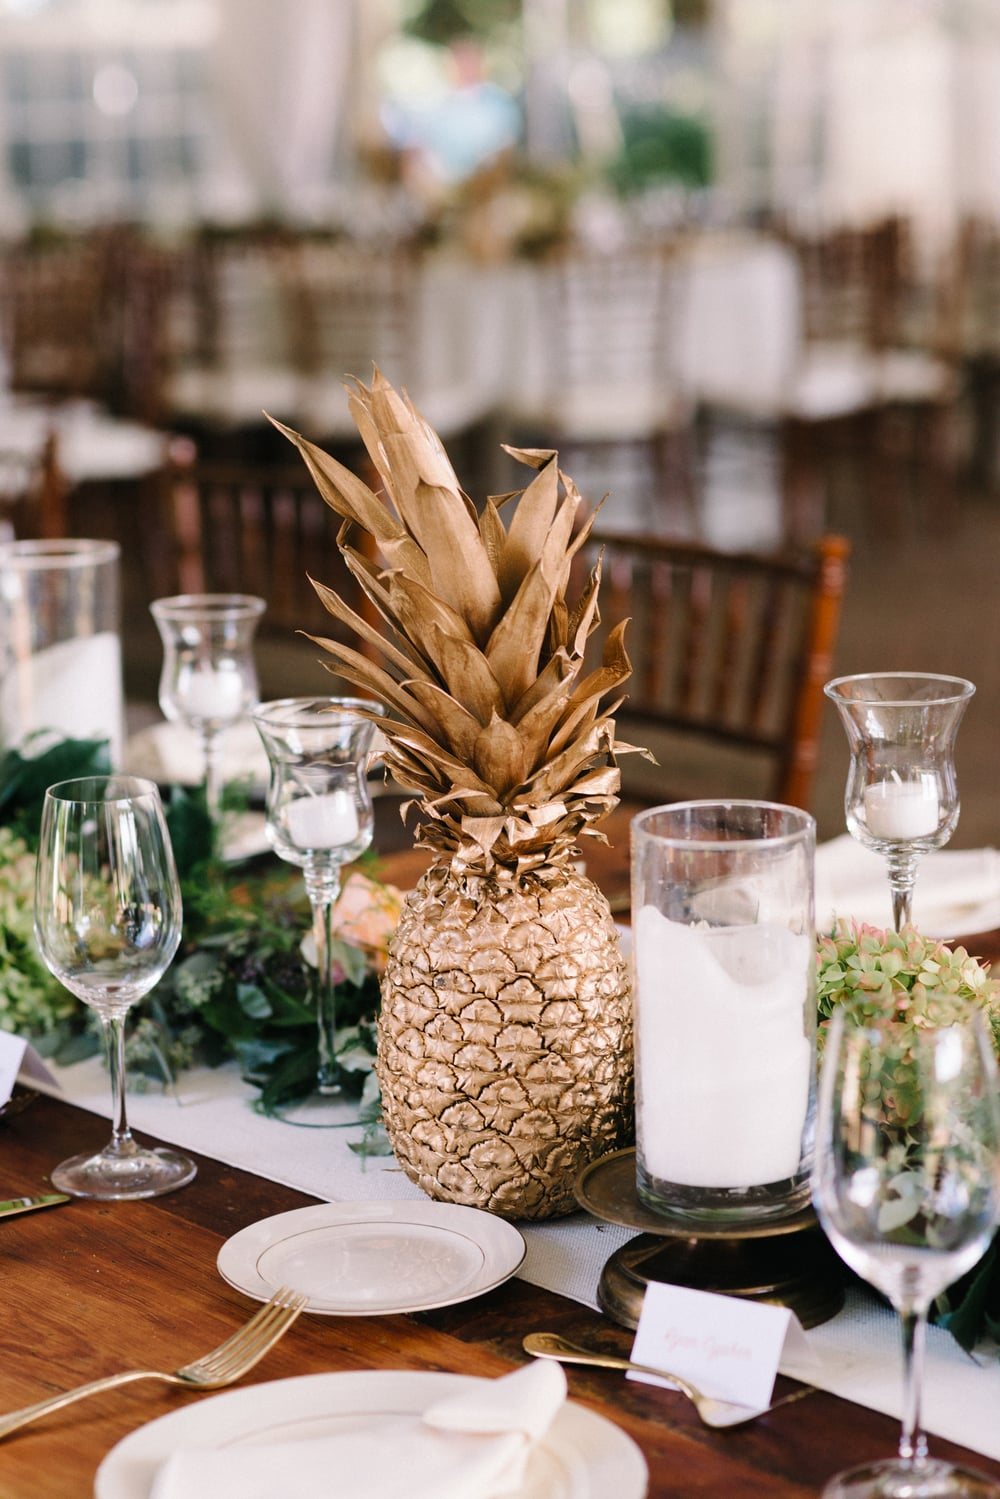 A Garden Party Florist, Inn at Fernbrook Farms, Michelle Lange Photography, Blush, Pineapple, Table Decor, Garland